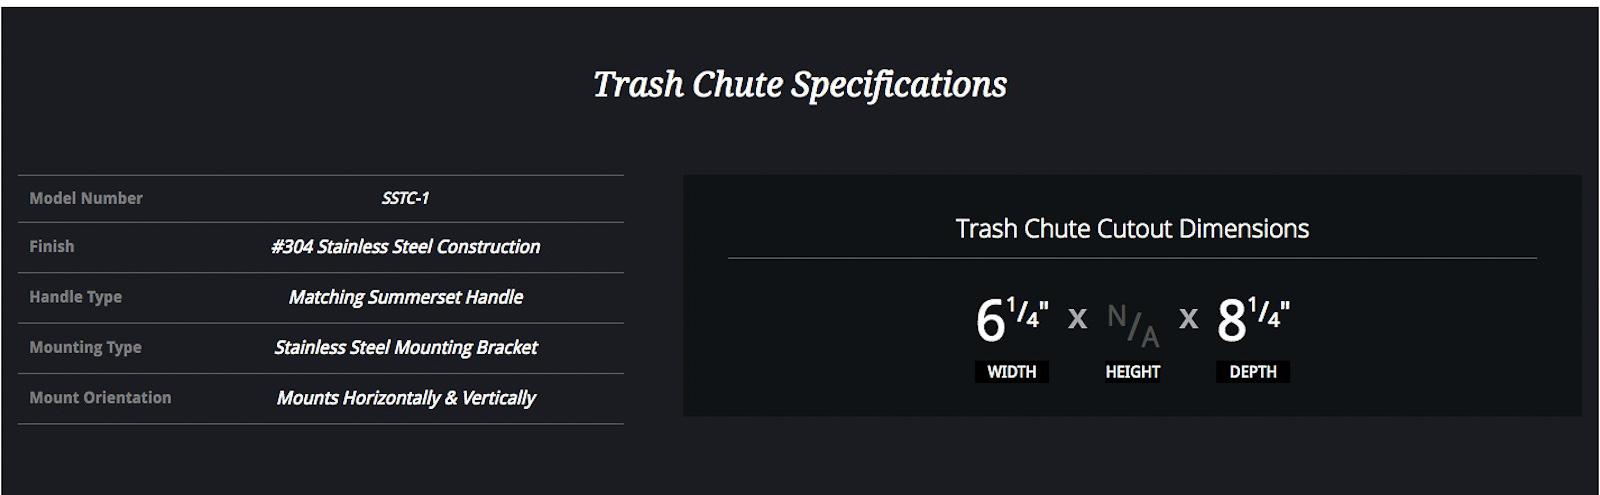 summerset-trash-chute-storage-drawers-sstc.jpg